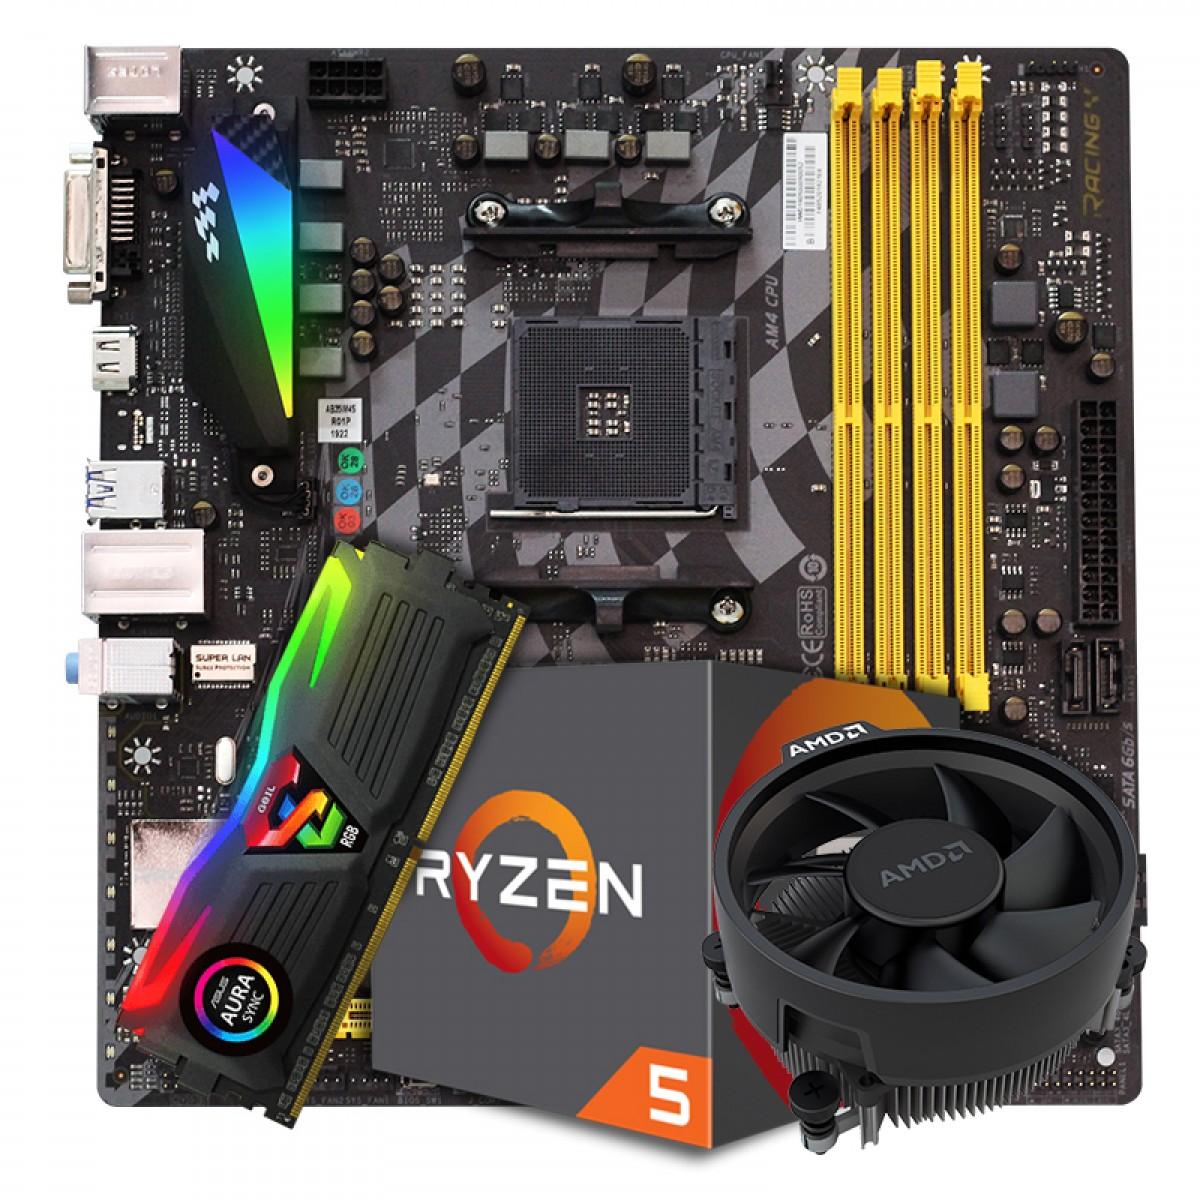 Kit Upgrade Placa Mãe BIOSTAR B350GTX DDR4 + Processador AMD Ryzen 5 2600 3.6GHz + Memória DDR4 8GB 3000MHZ